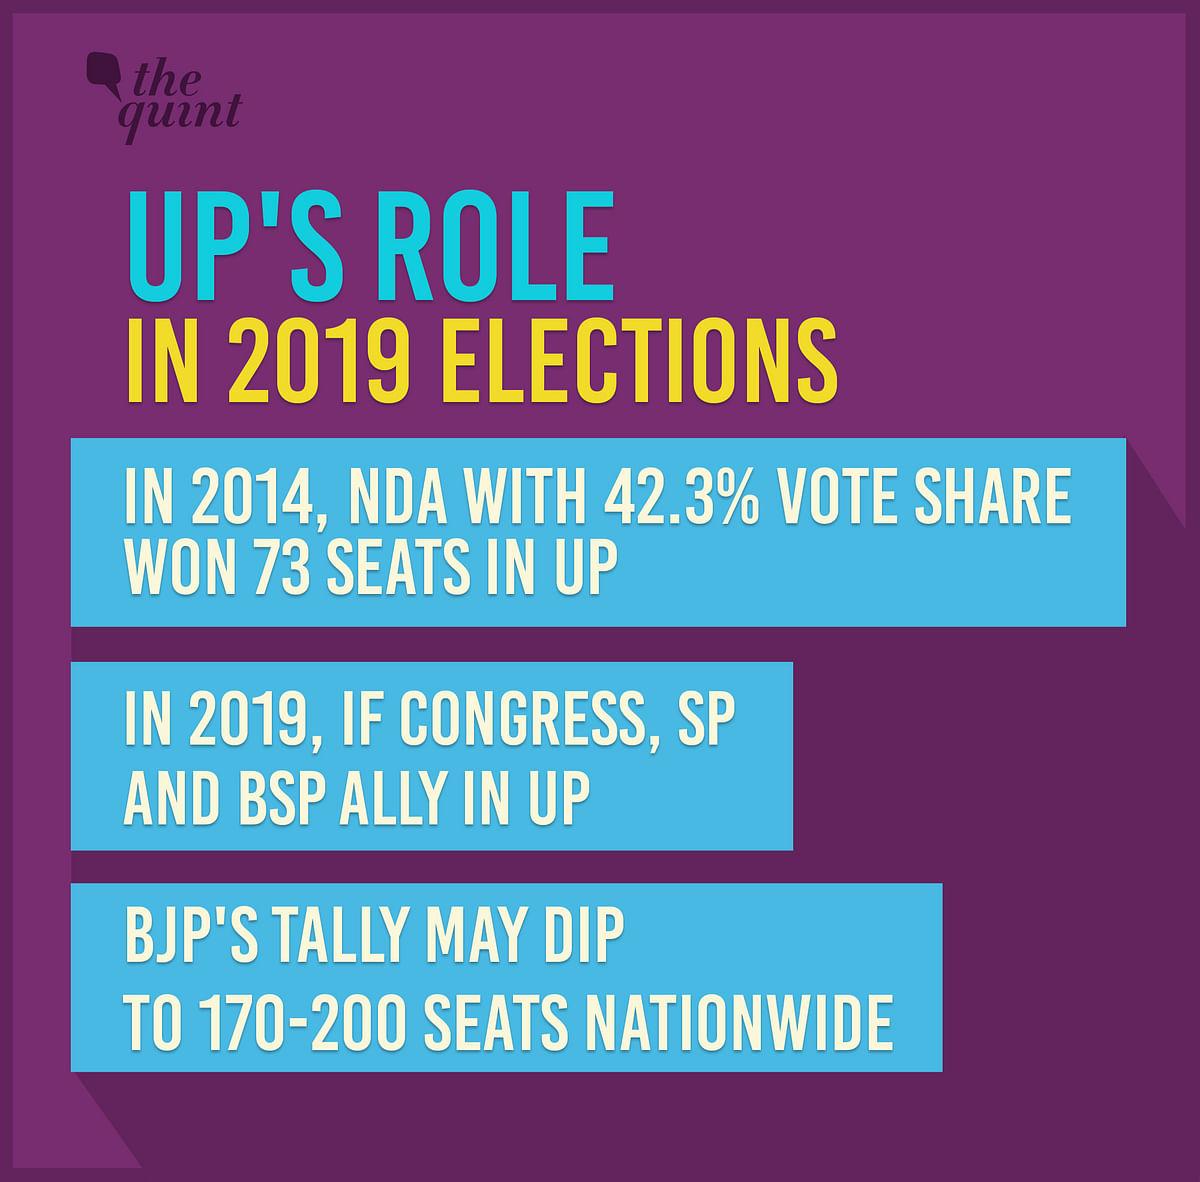 Ex-Noida Clerk & a Lady With Zero LS Seats to Decide Modi's Fate